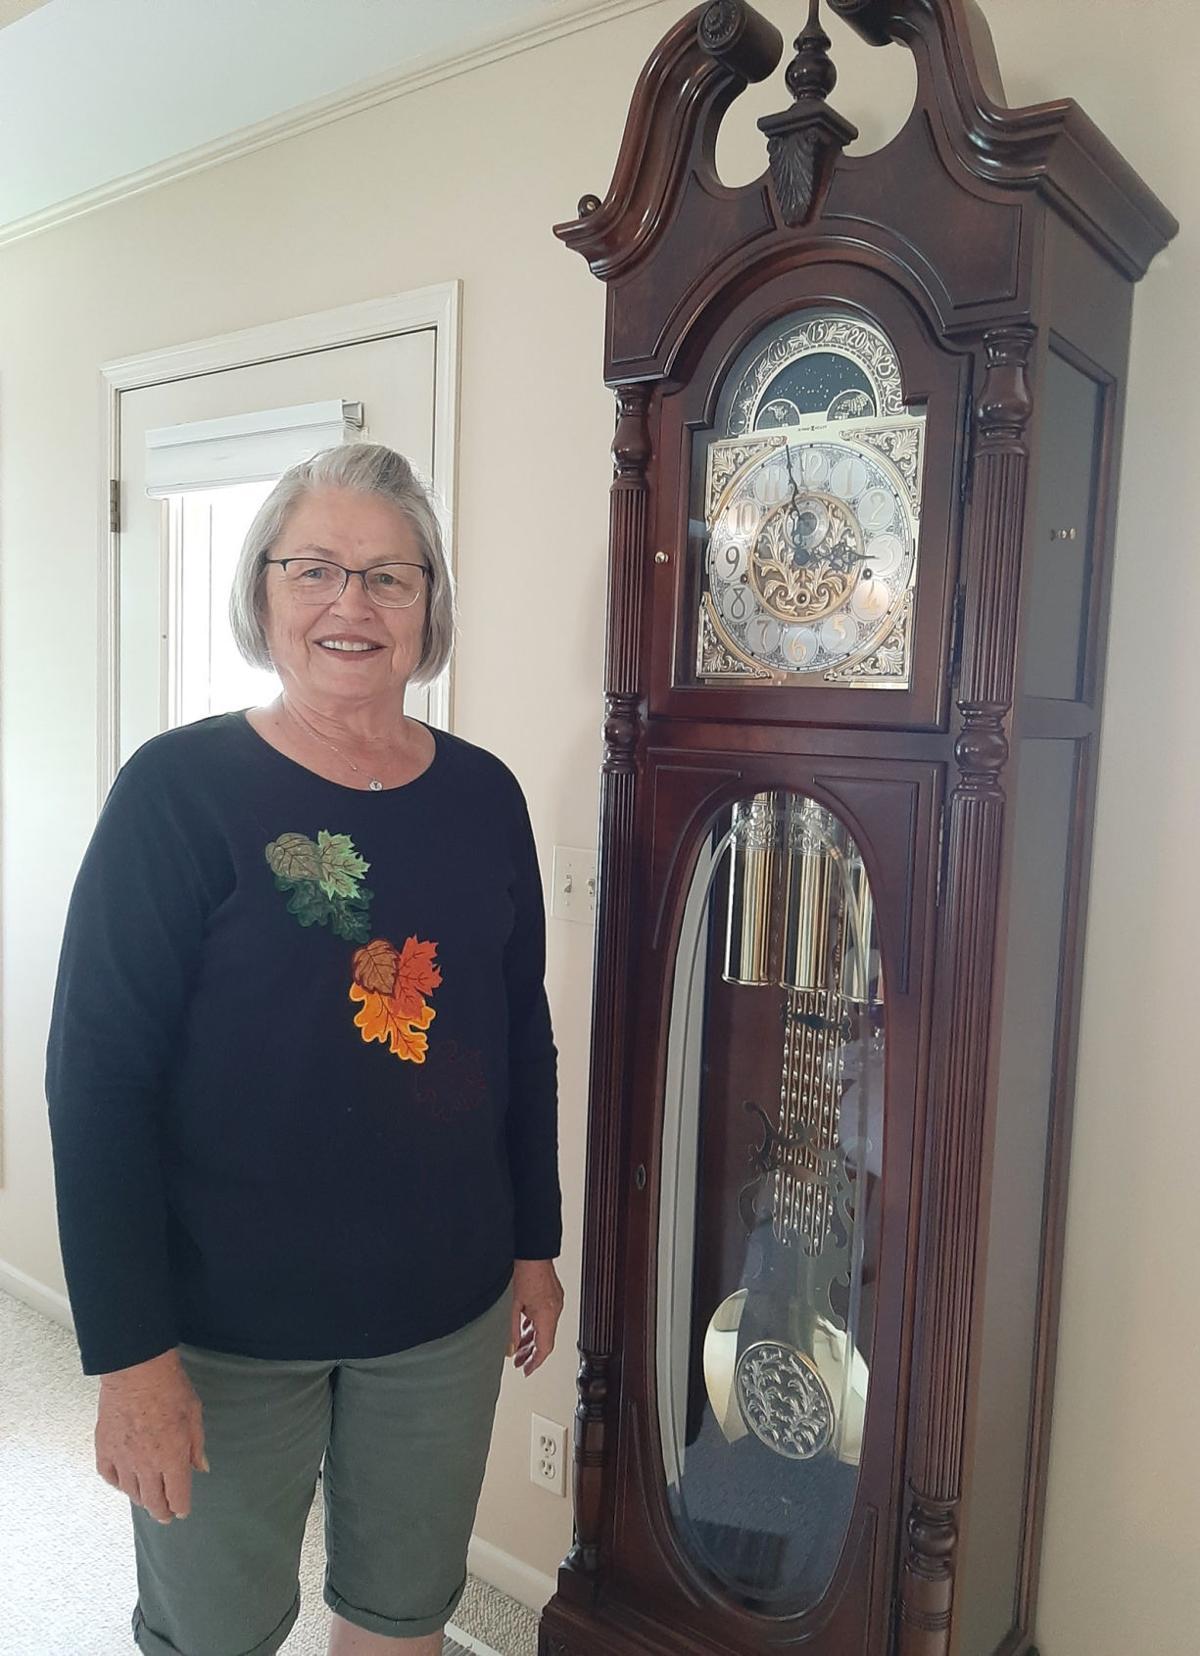 Woman near clock